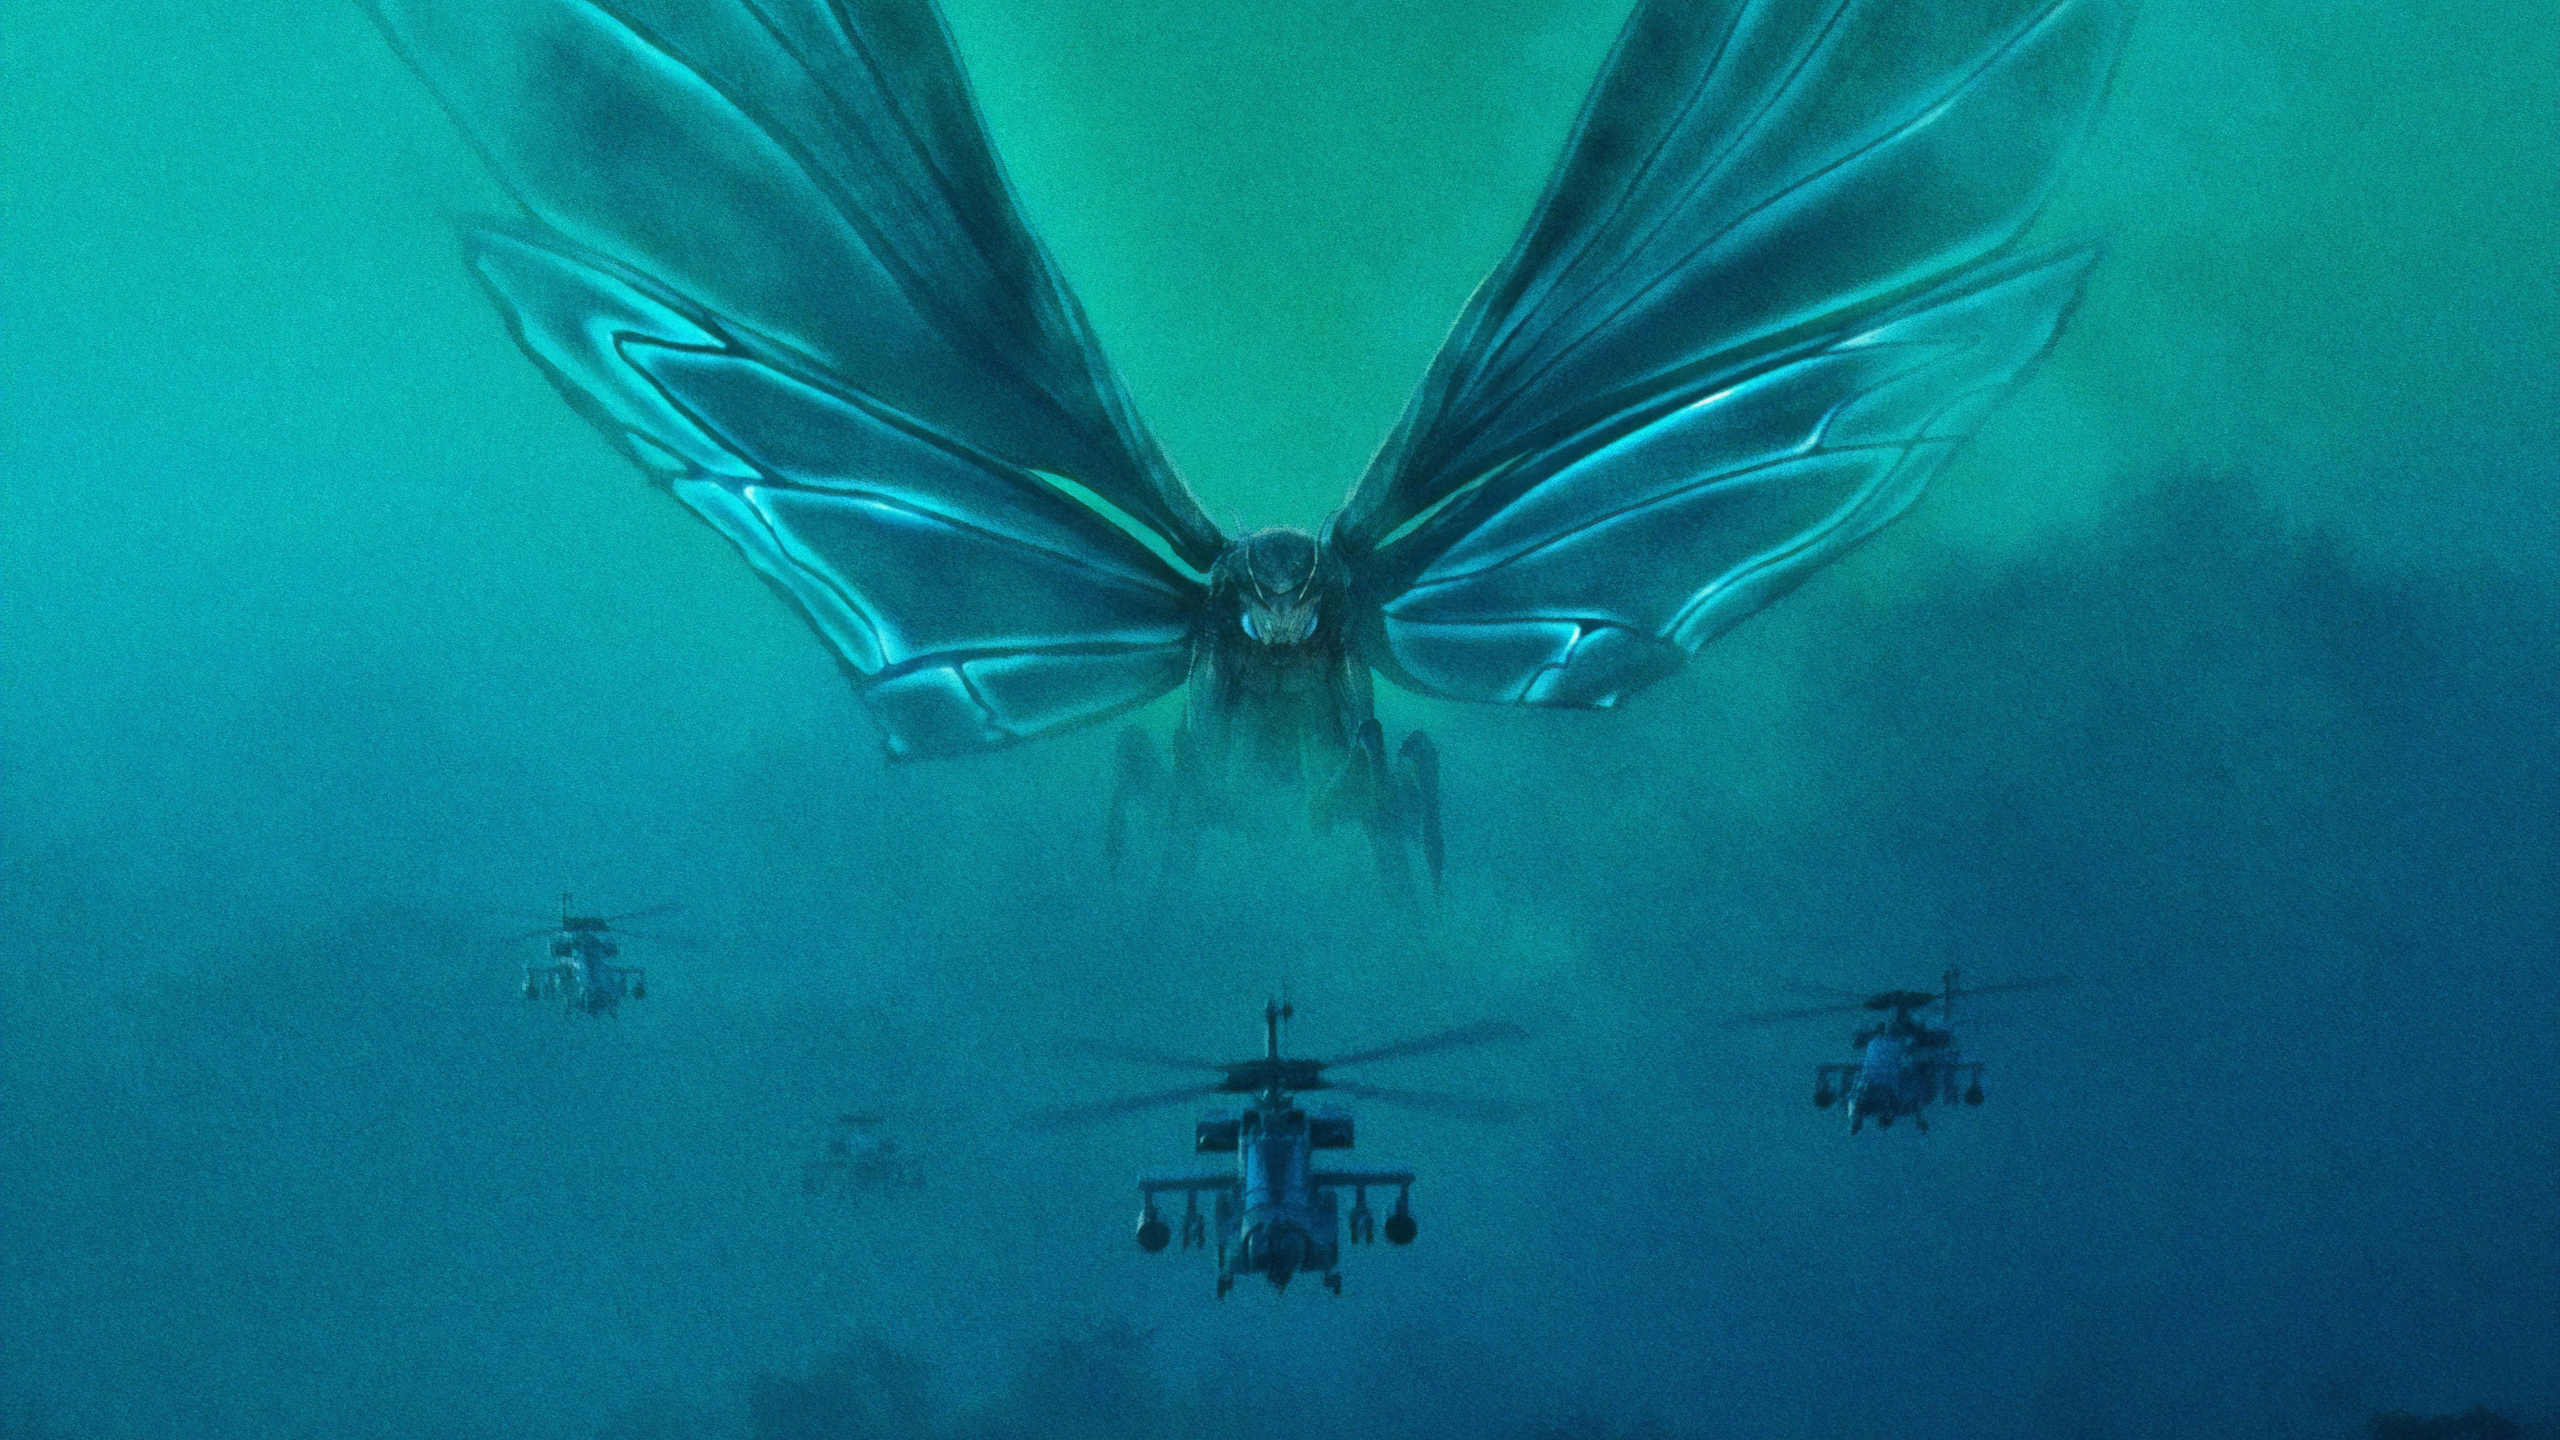 31 Godzilla And Mothra Wallpapers On Wallpapersafari